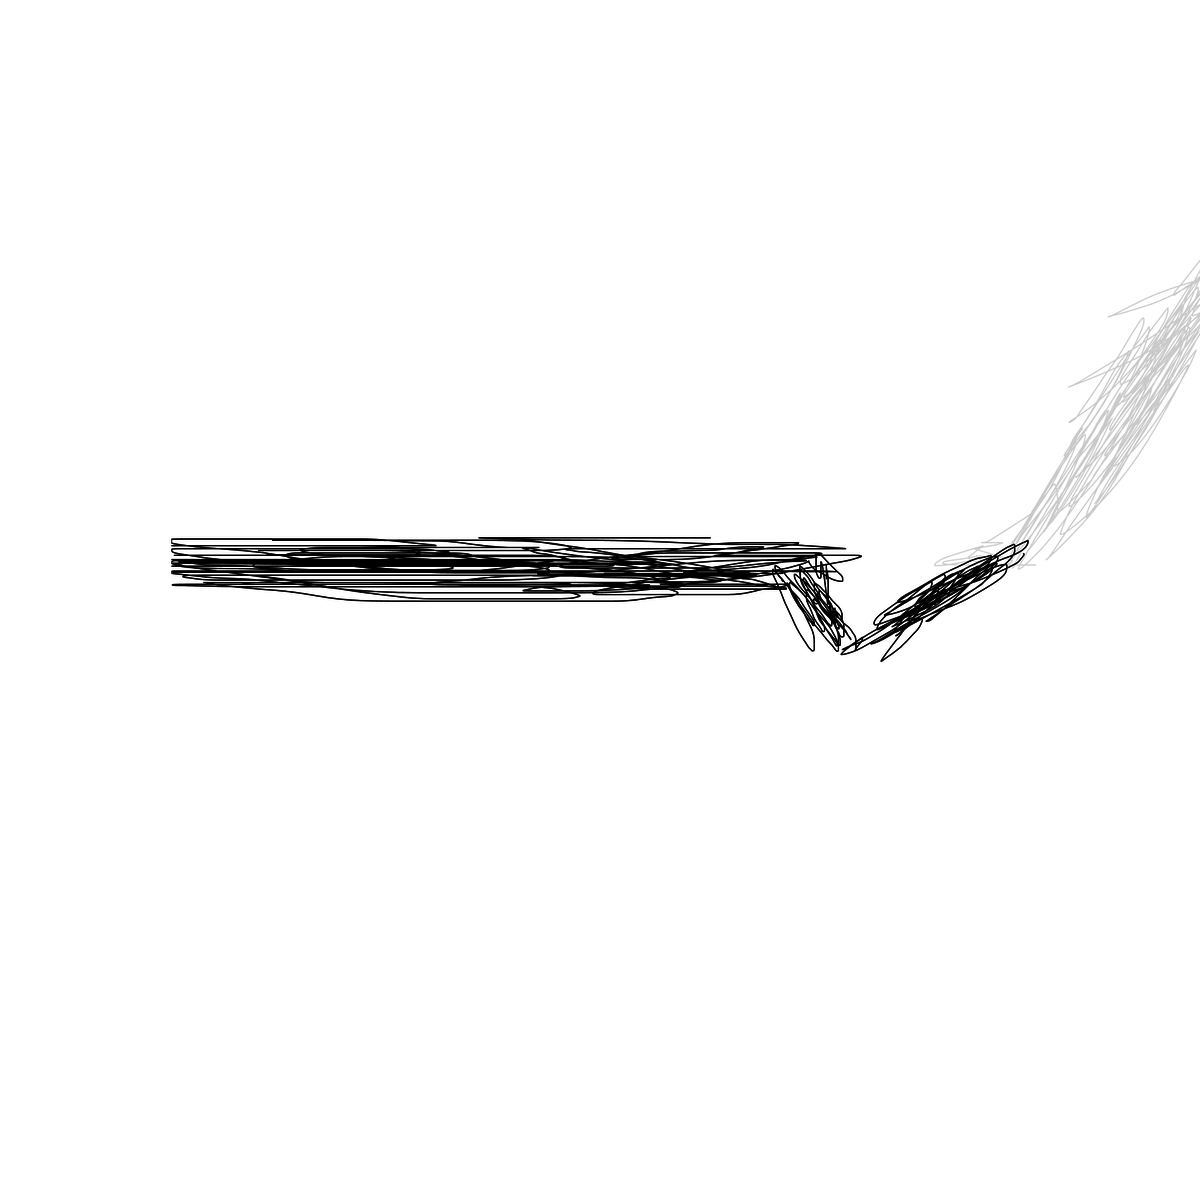 BAAAM drawing#11381 lat:52.4759712219238300lng: 13.4061622619628900